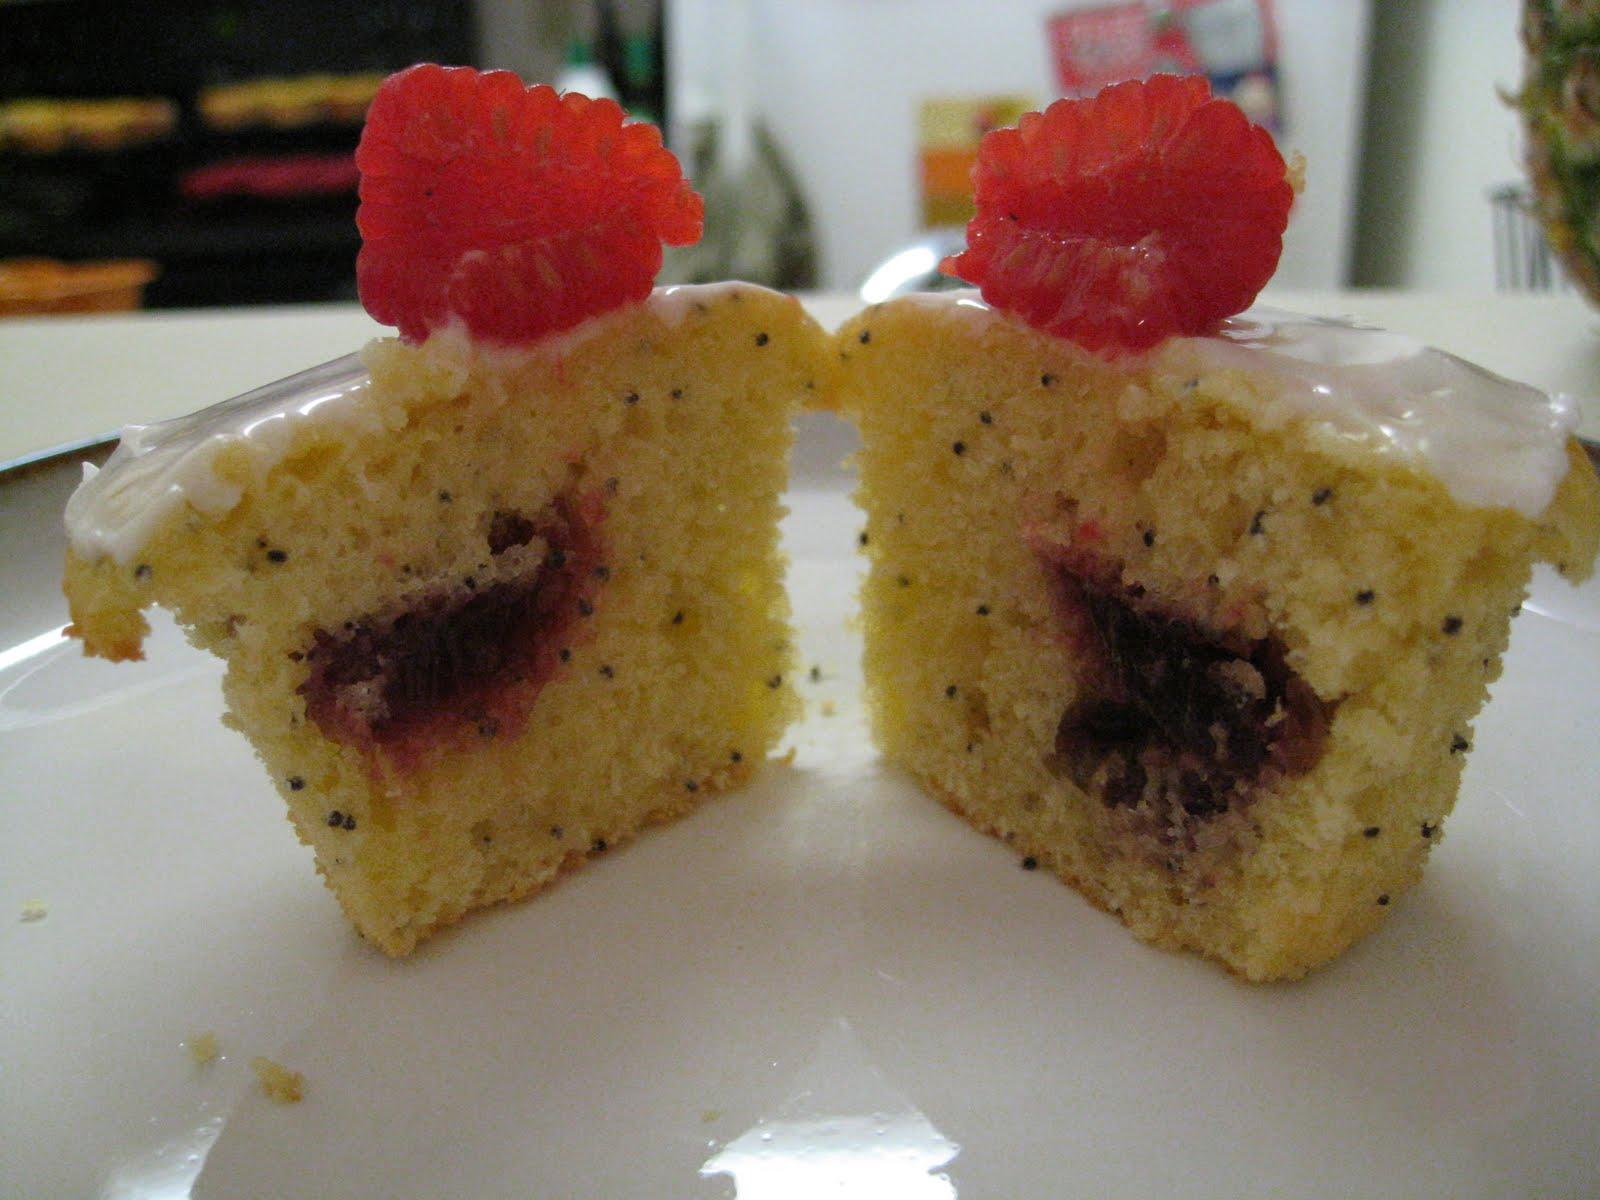 Lemon cake mix recipes with raspberry